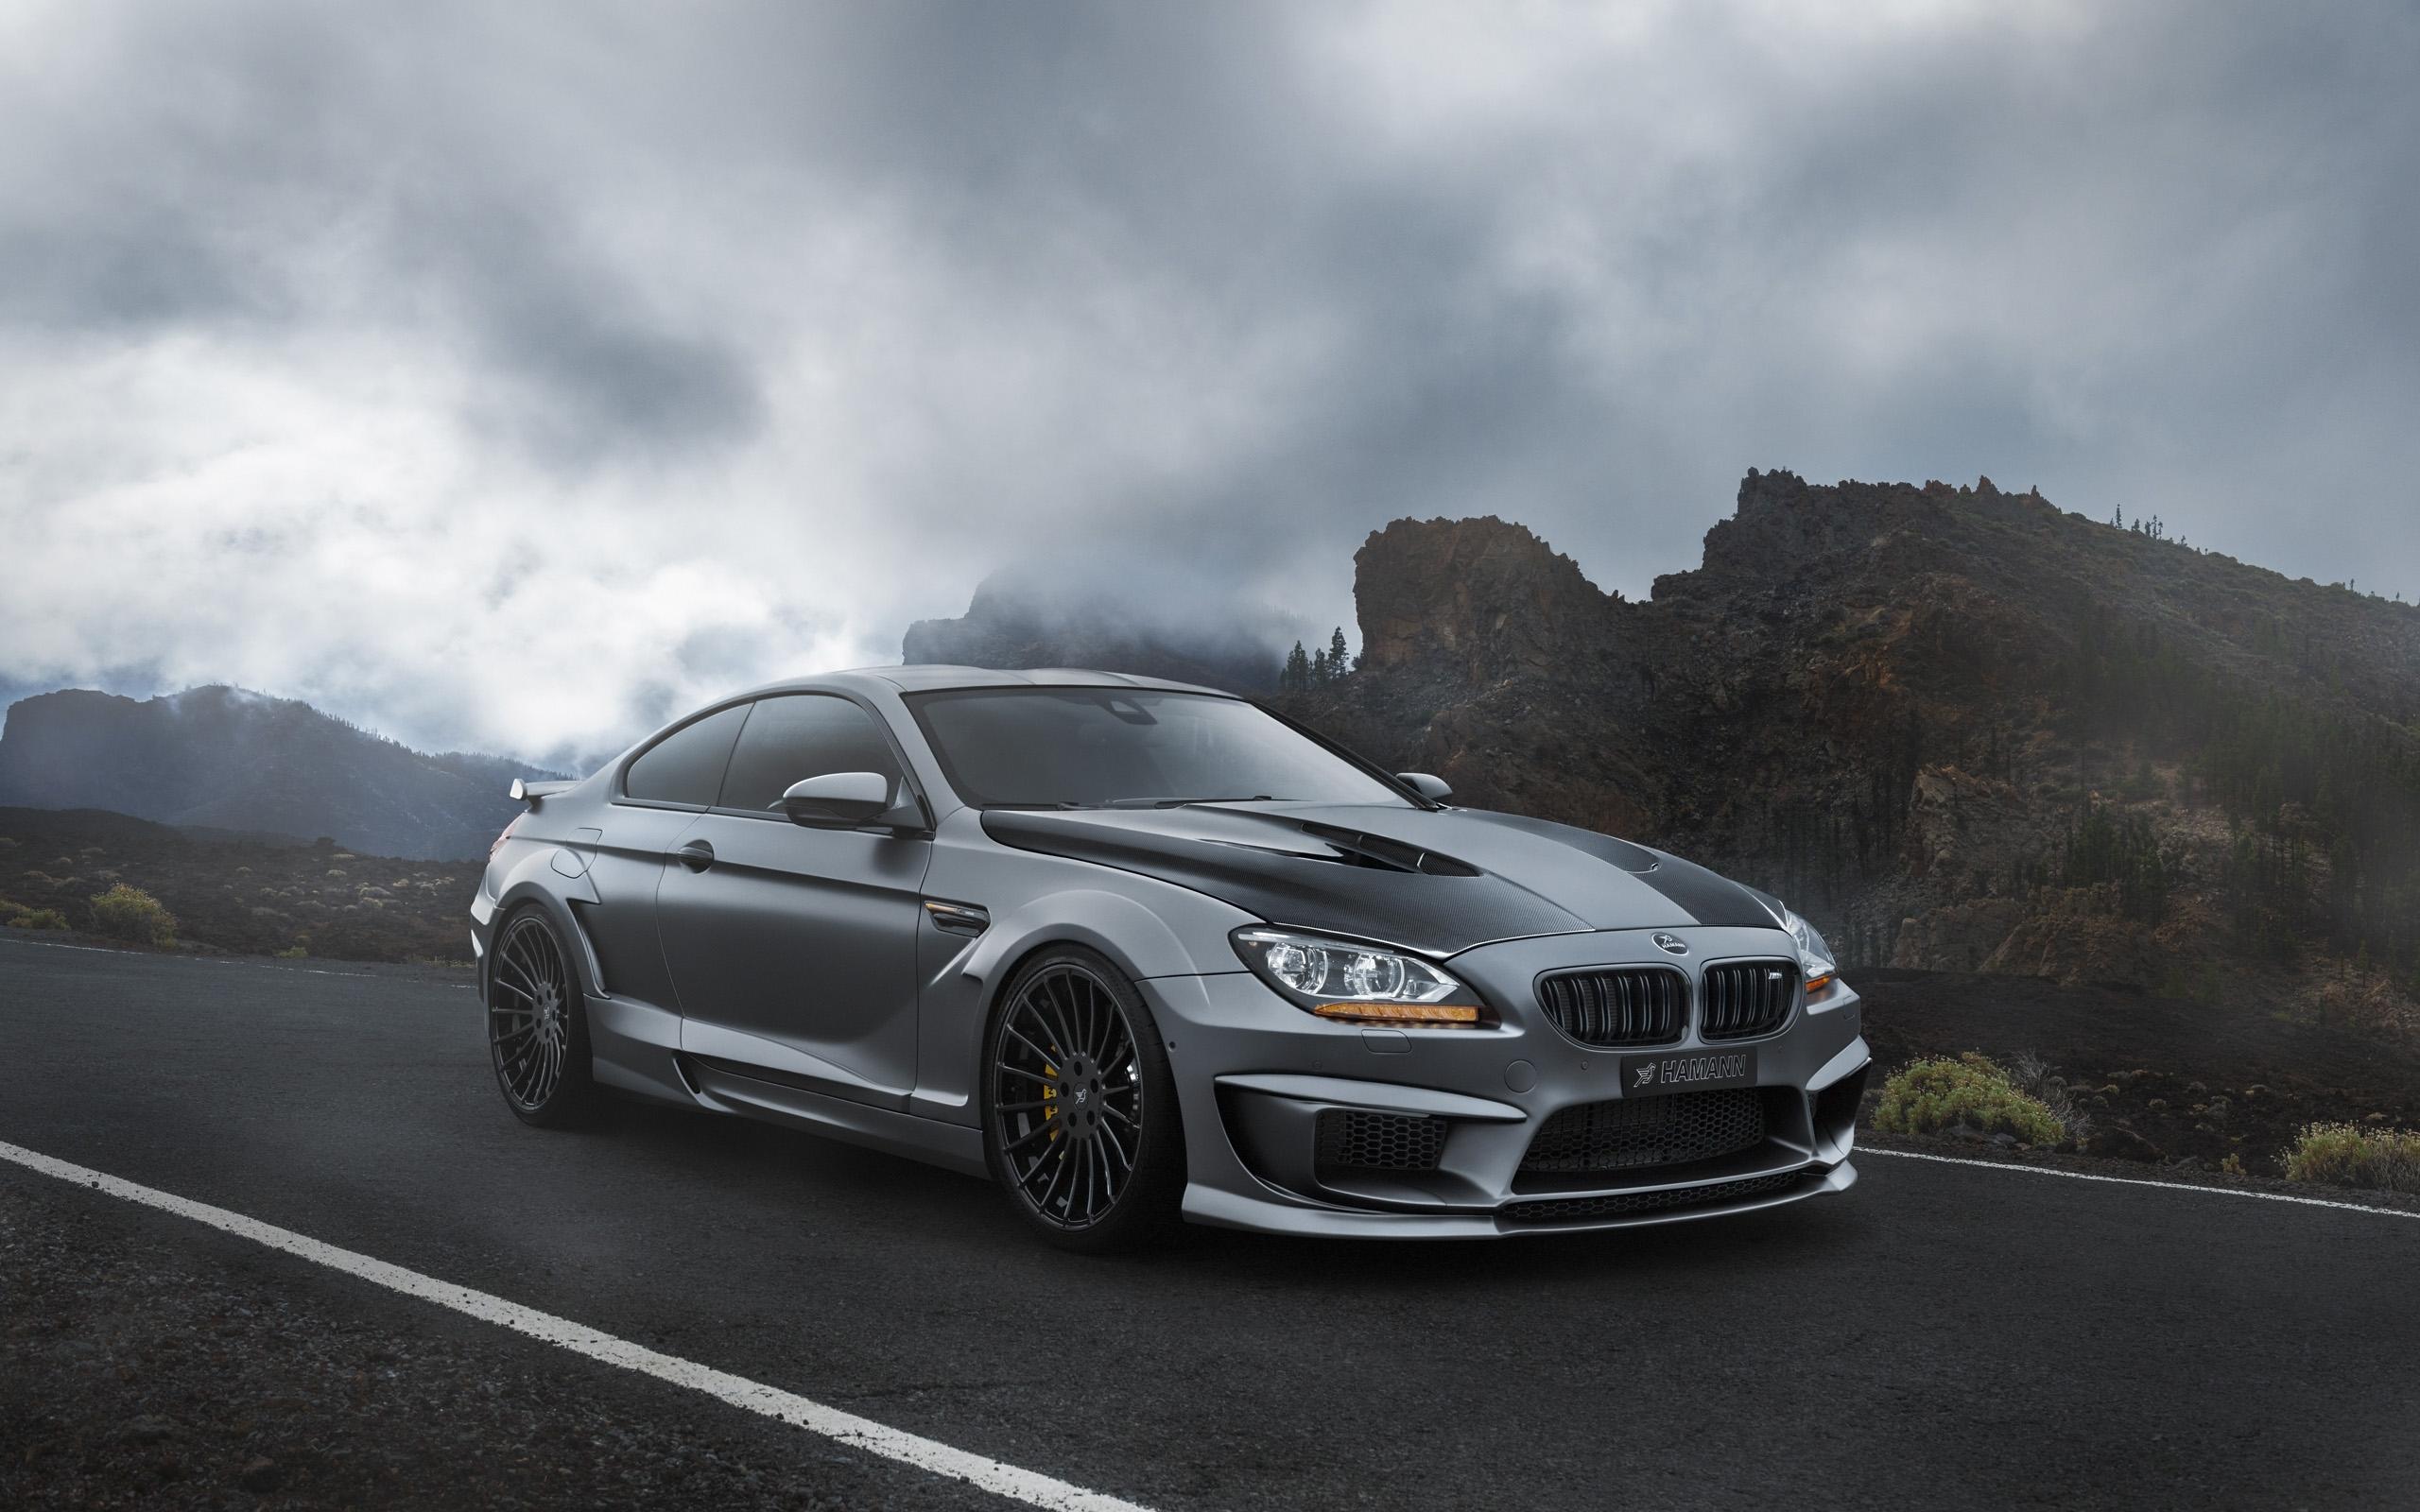 2014 Hamann BMW M6 Mirr6r Wallpaper HD Car Wallpapers 2560x1600